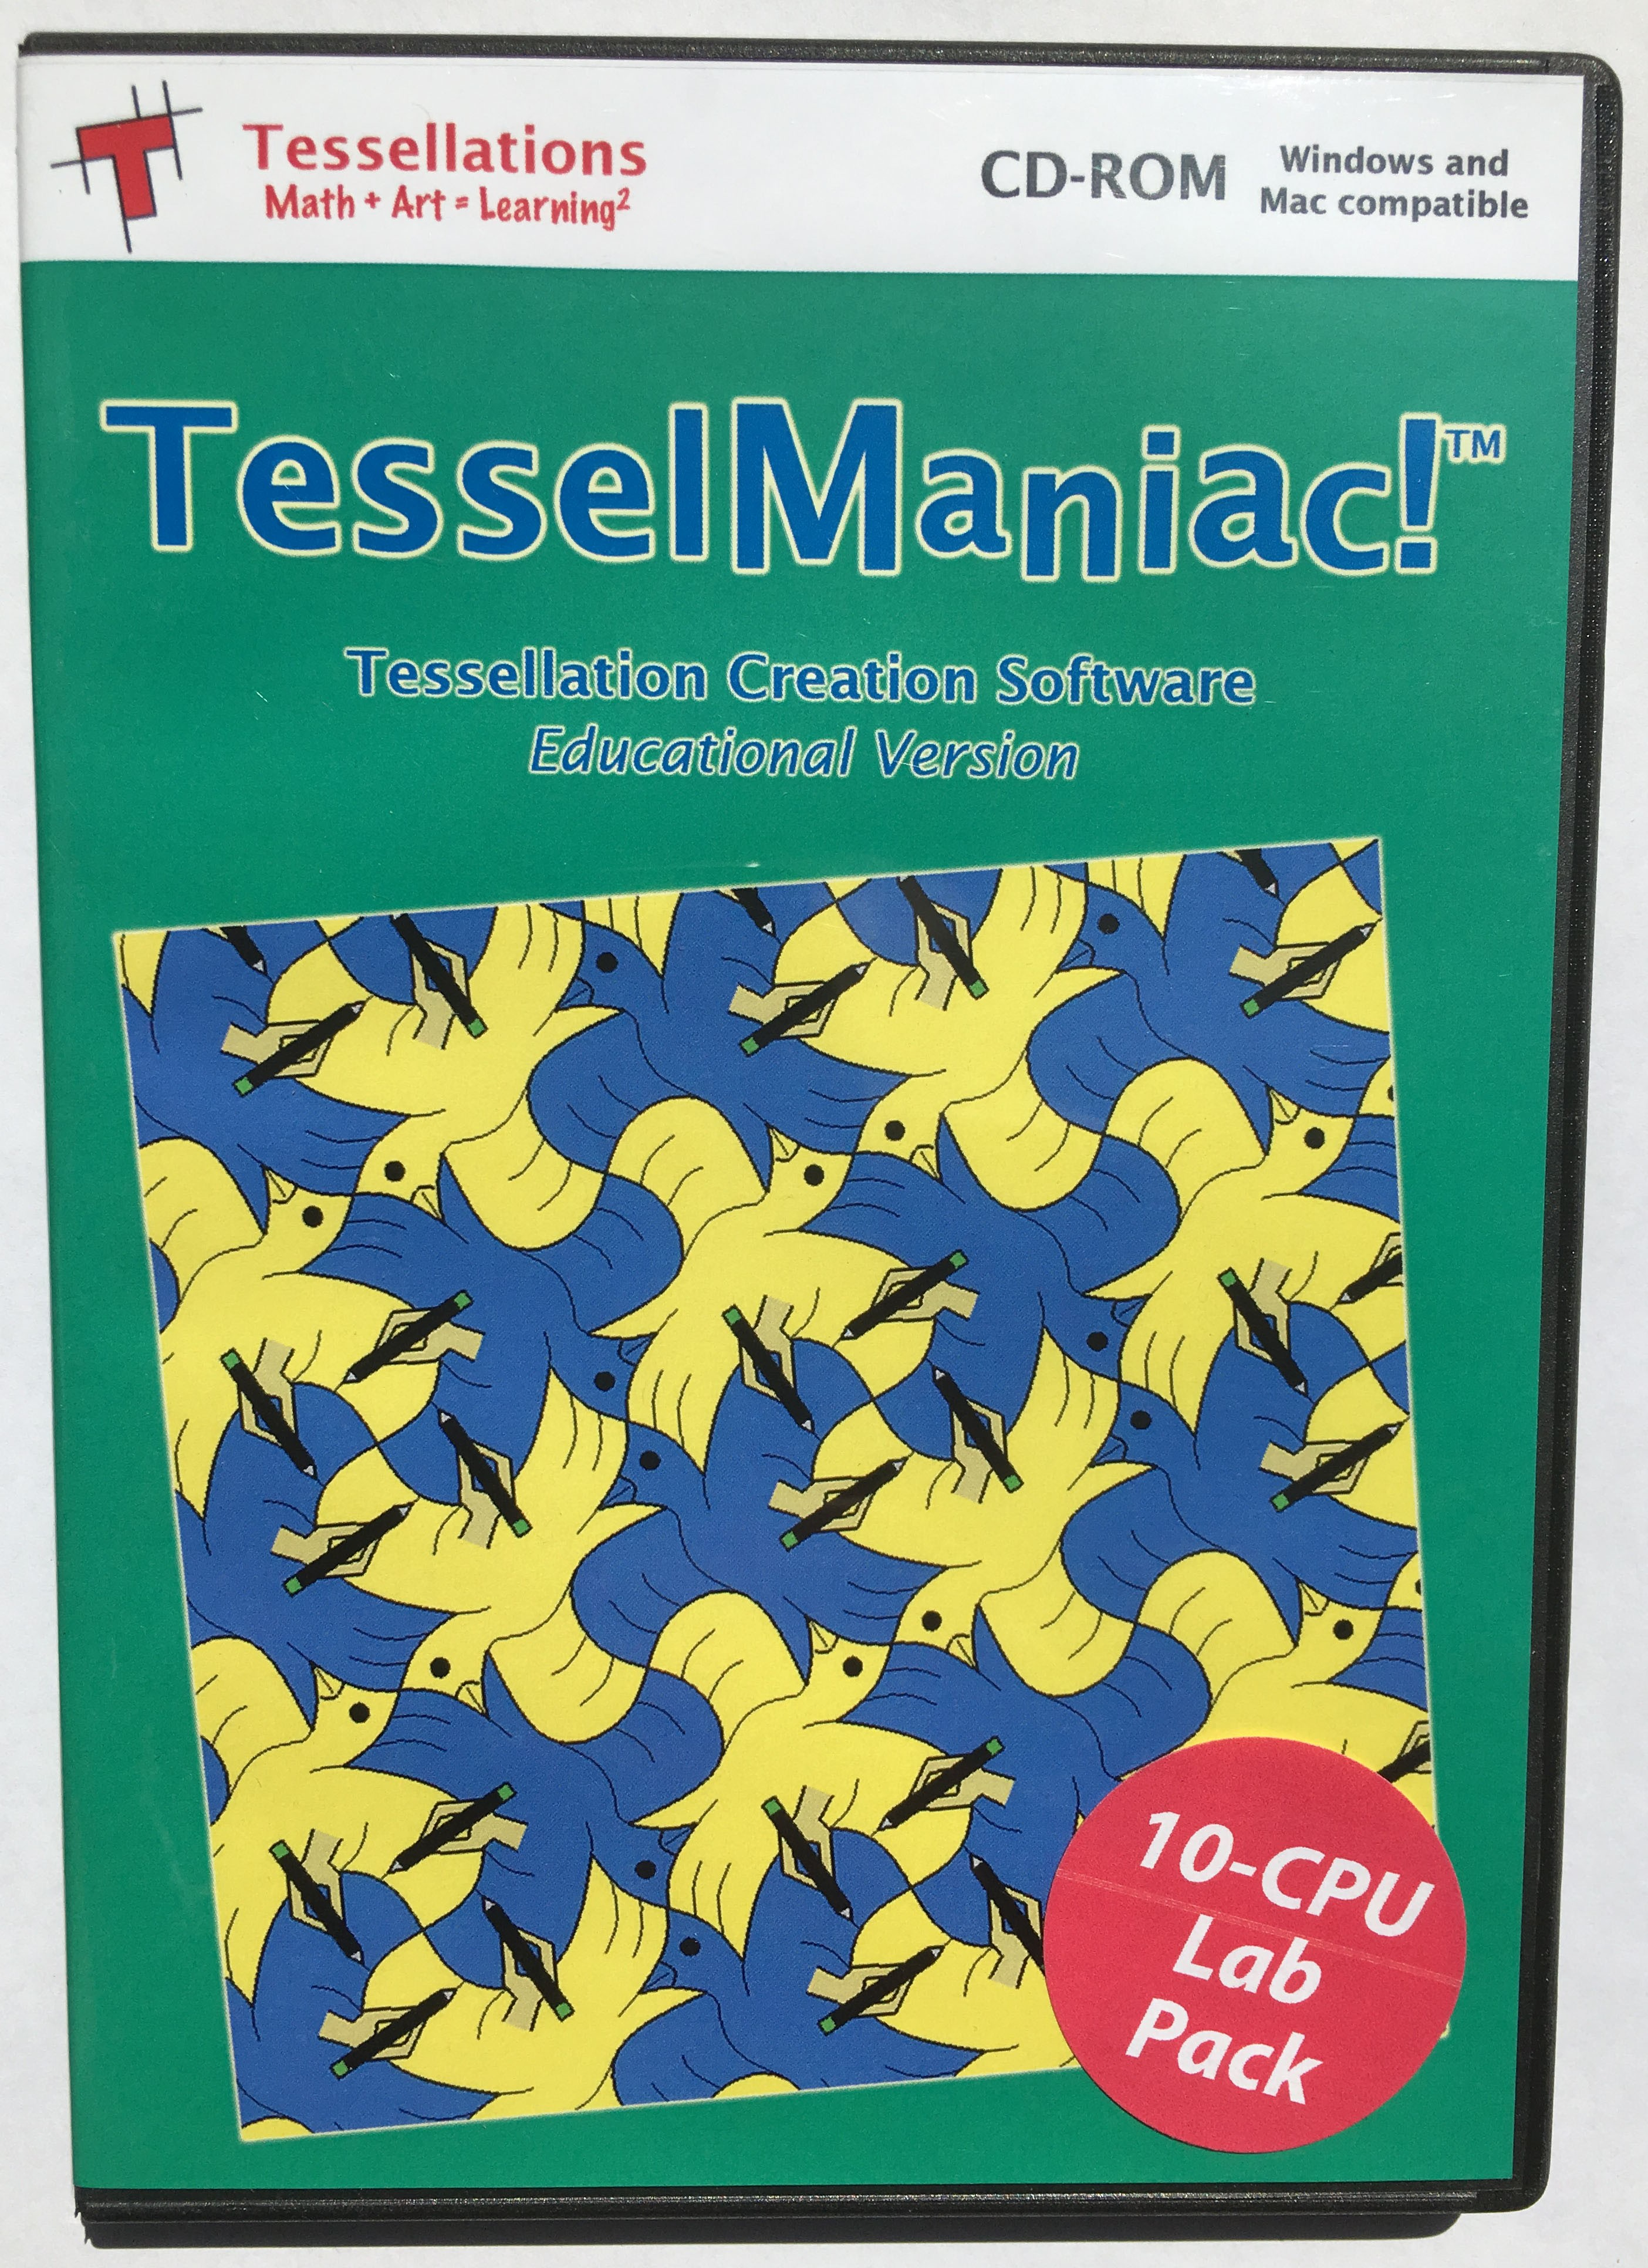 Tesselmaniac! 10 User